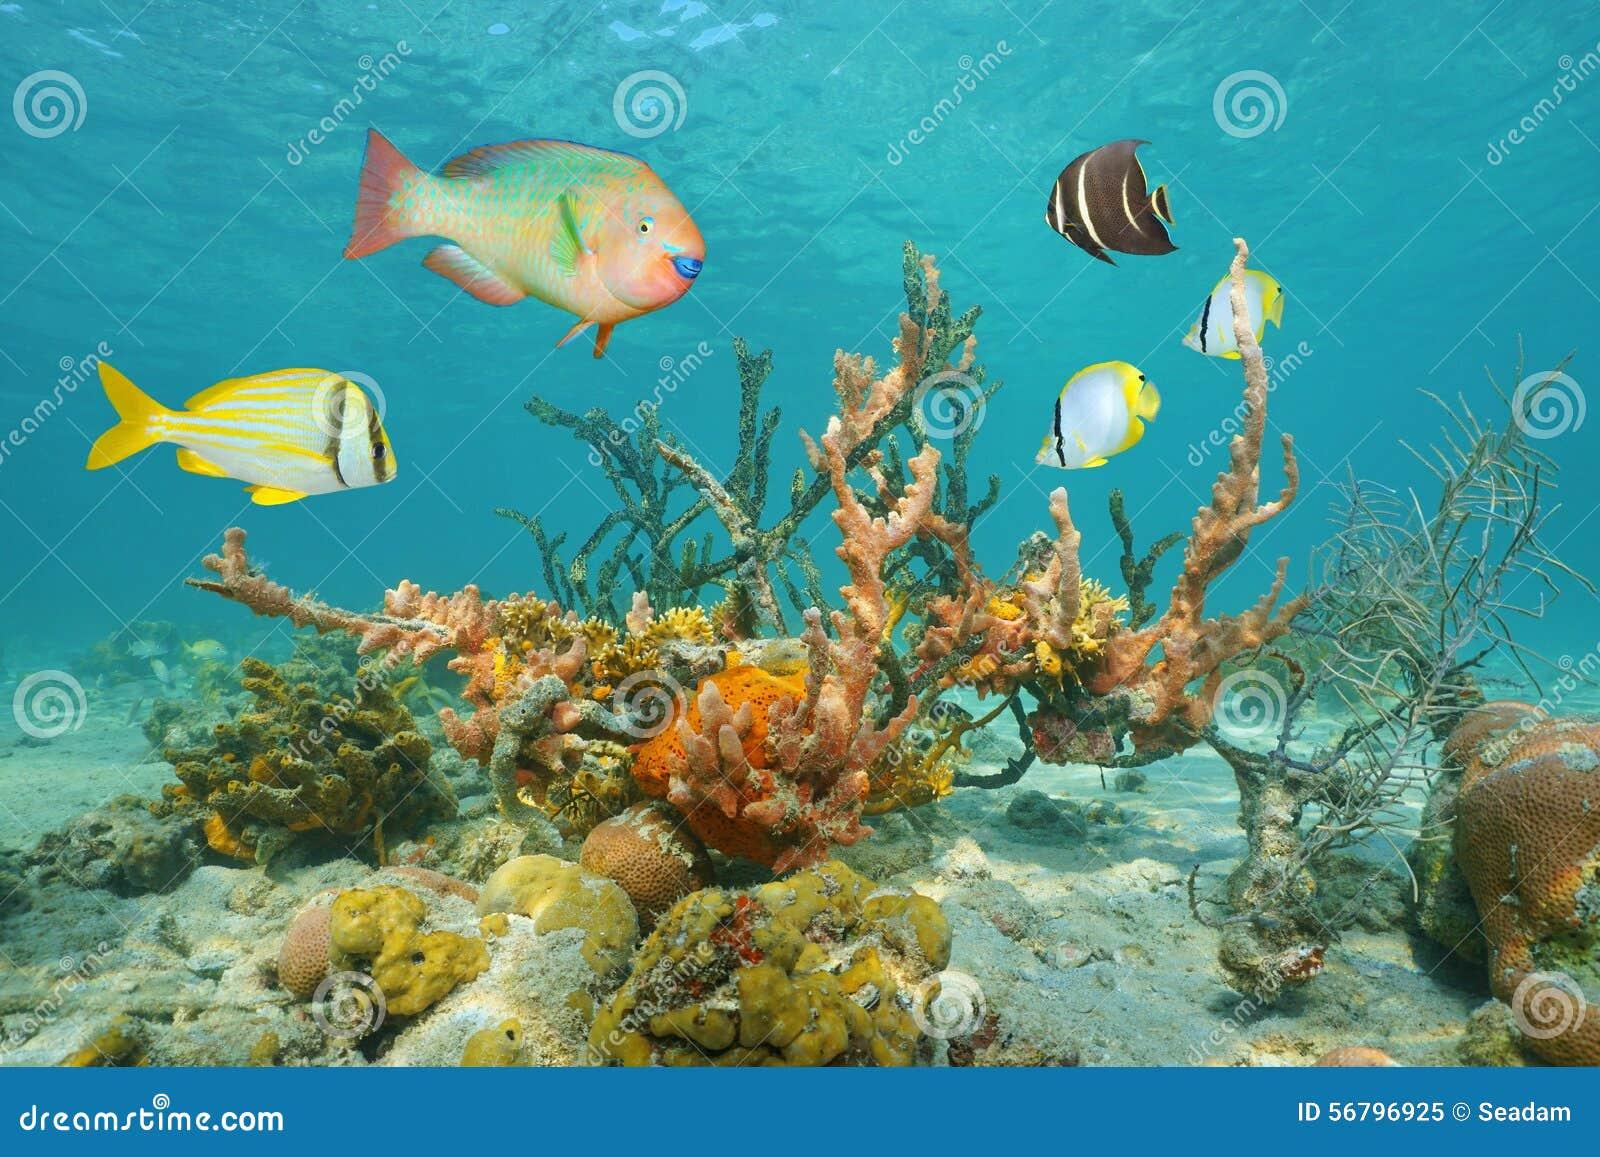 Colorful Marine Life Stock Image - Image: 29798251 |Colorful Underwater Life